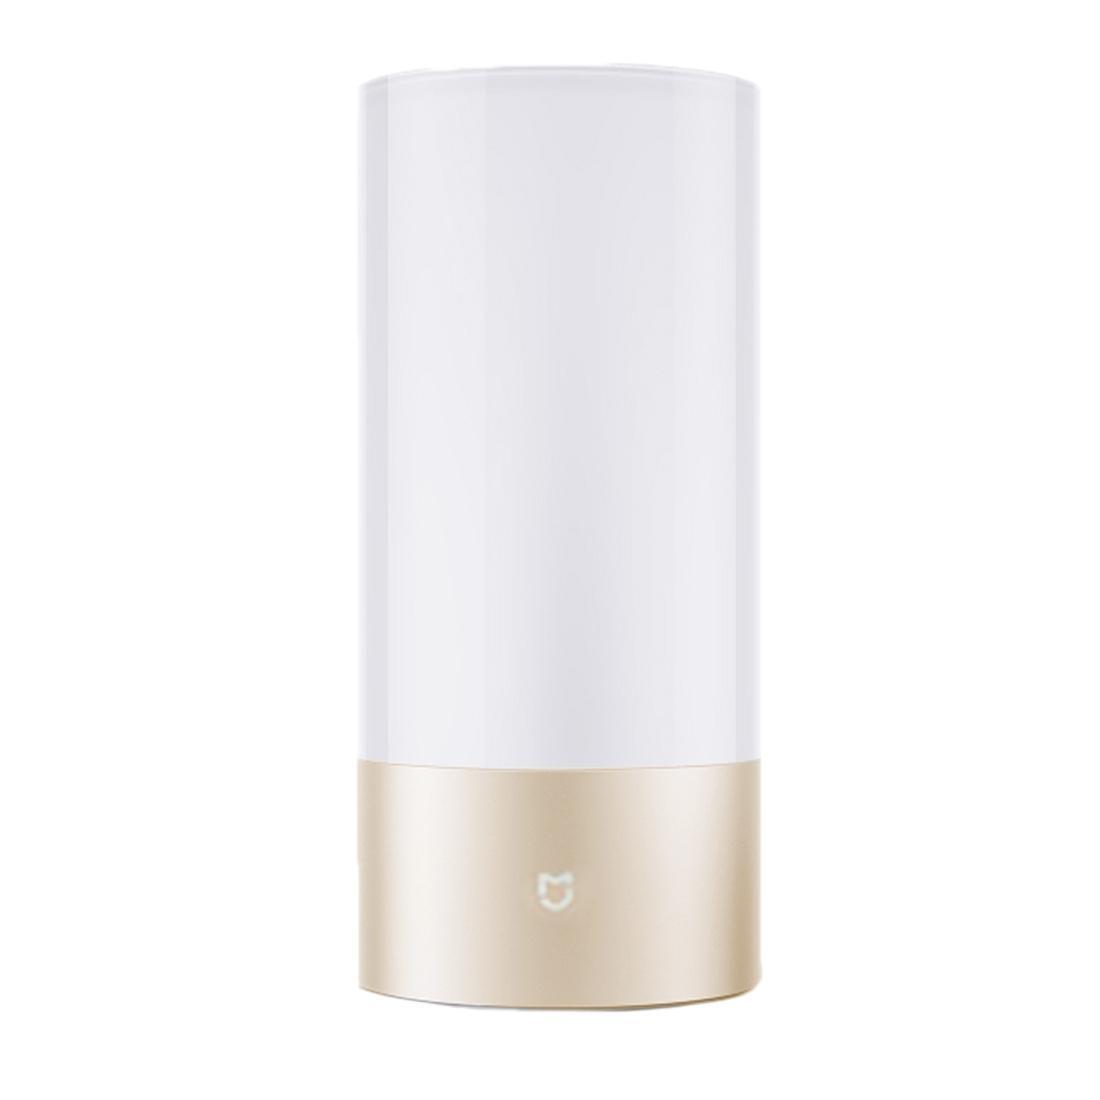 LED300LMBluetoothWiFiTouch Original App Control Mi Xiaomi Indoor Mijia ControlMobile Phone Light14 Gold Bedside Lamp Night knX80wNOP